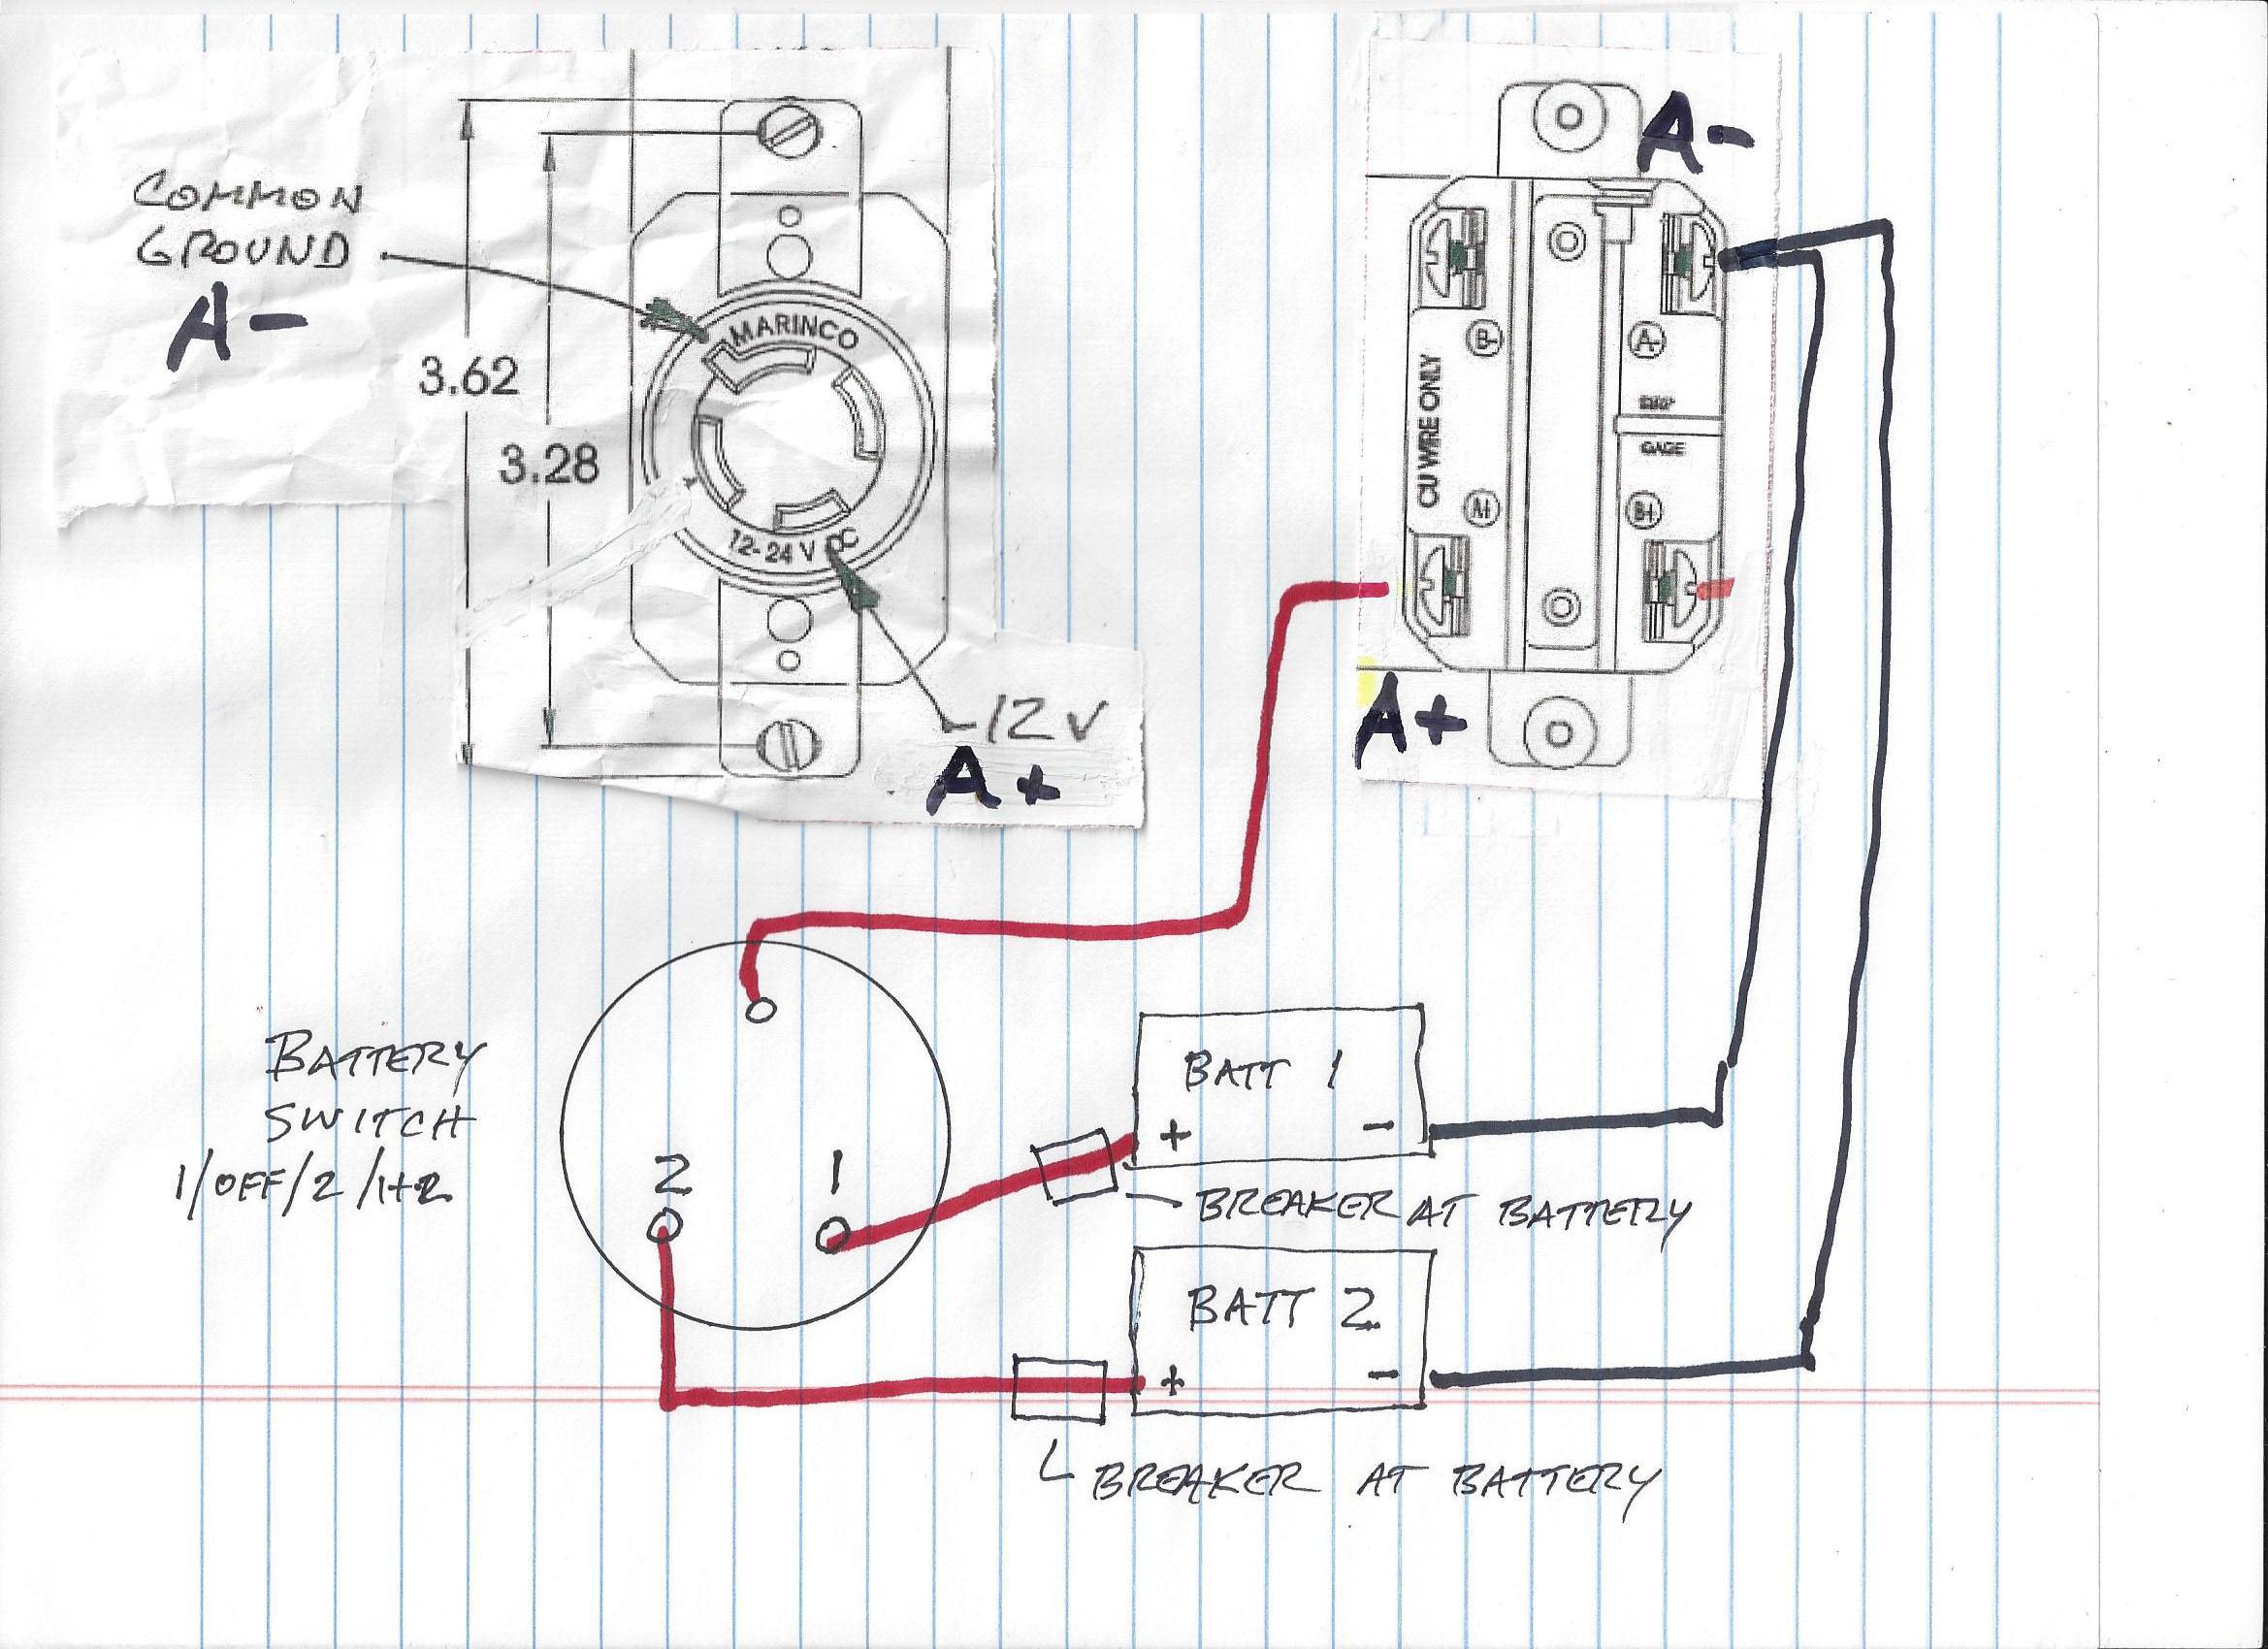 24 Volt Wiring Diagram For Trolling Motor New Opinion Setup 2 - 24 Volt Trolling Motor Wiring Diagram